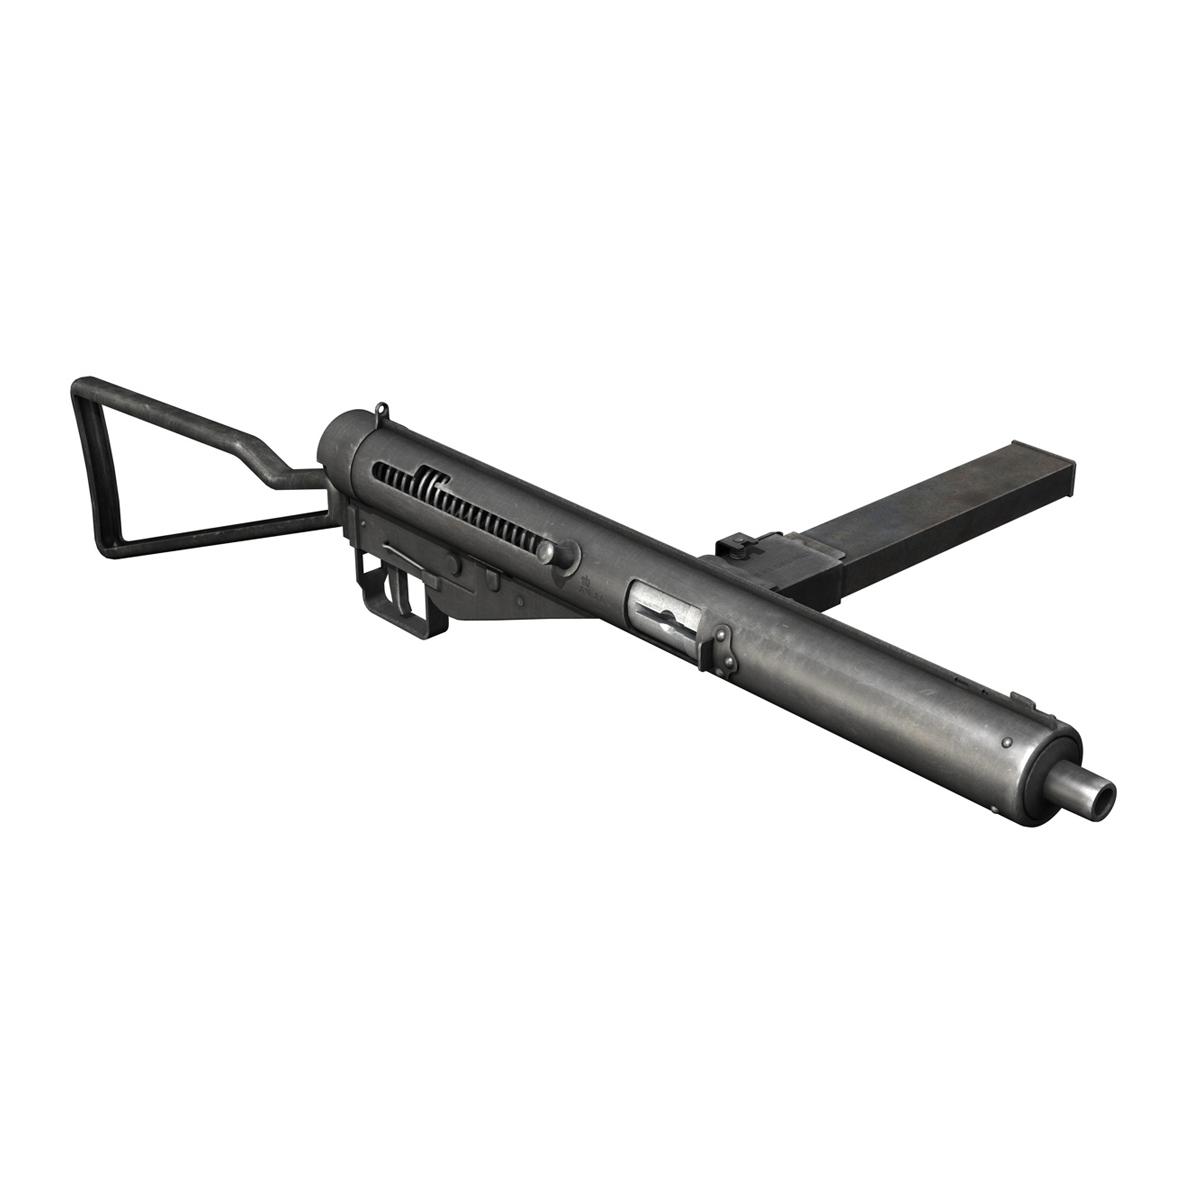 sten mk.iii submachine gun 3d model 3ds fbx c4d lwo obj 195111